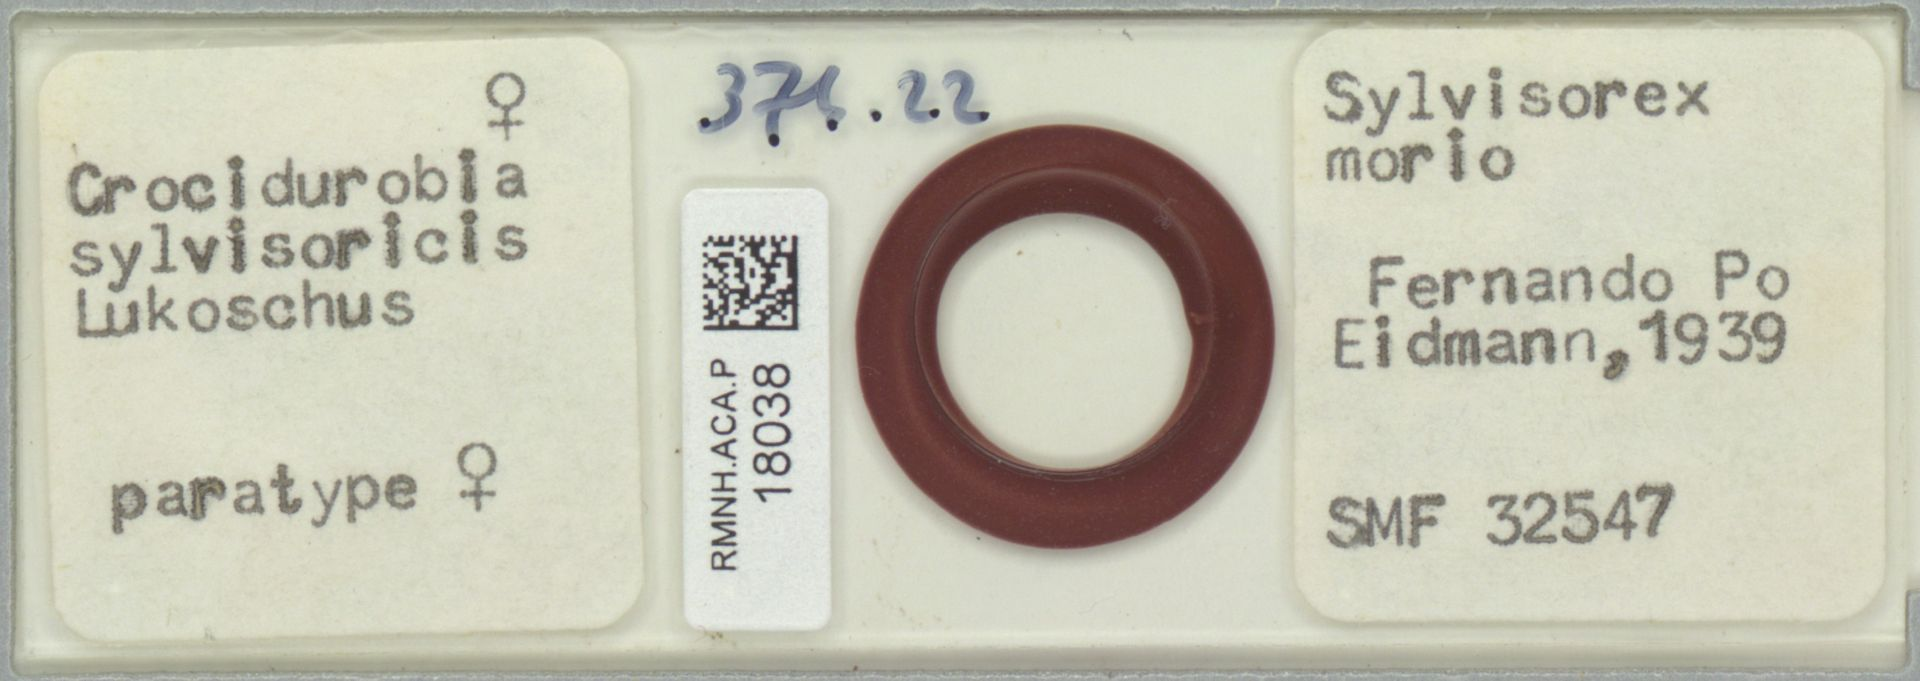 RMNH.ACA.P.18038 | Crocidurobia sylvisoricis